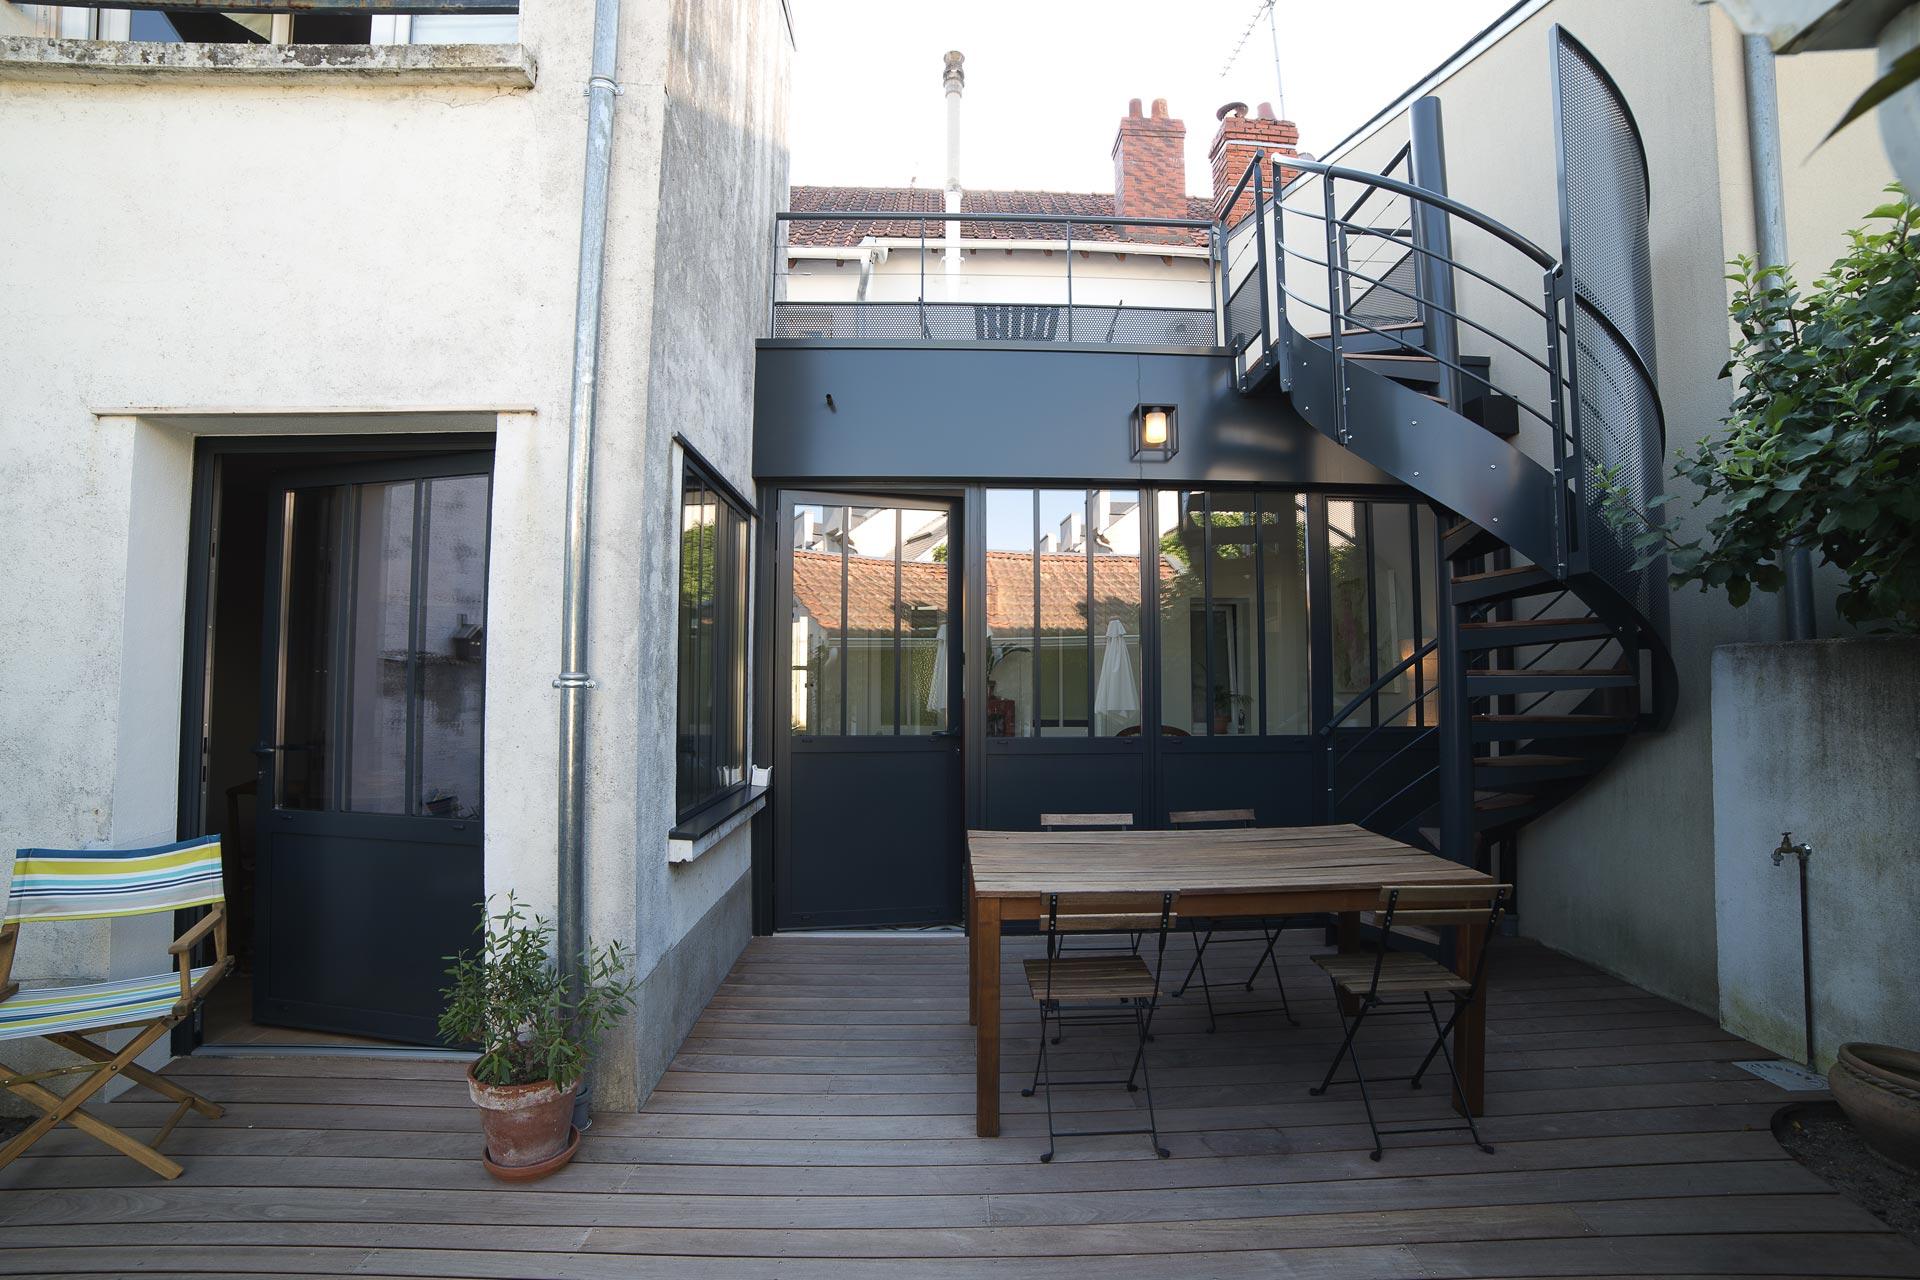 Extension véranda, toiture et terrasse